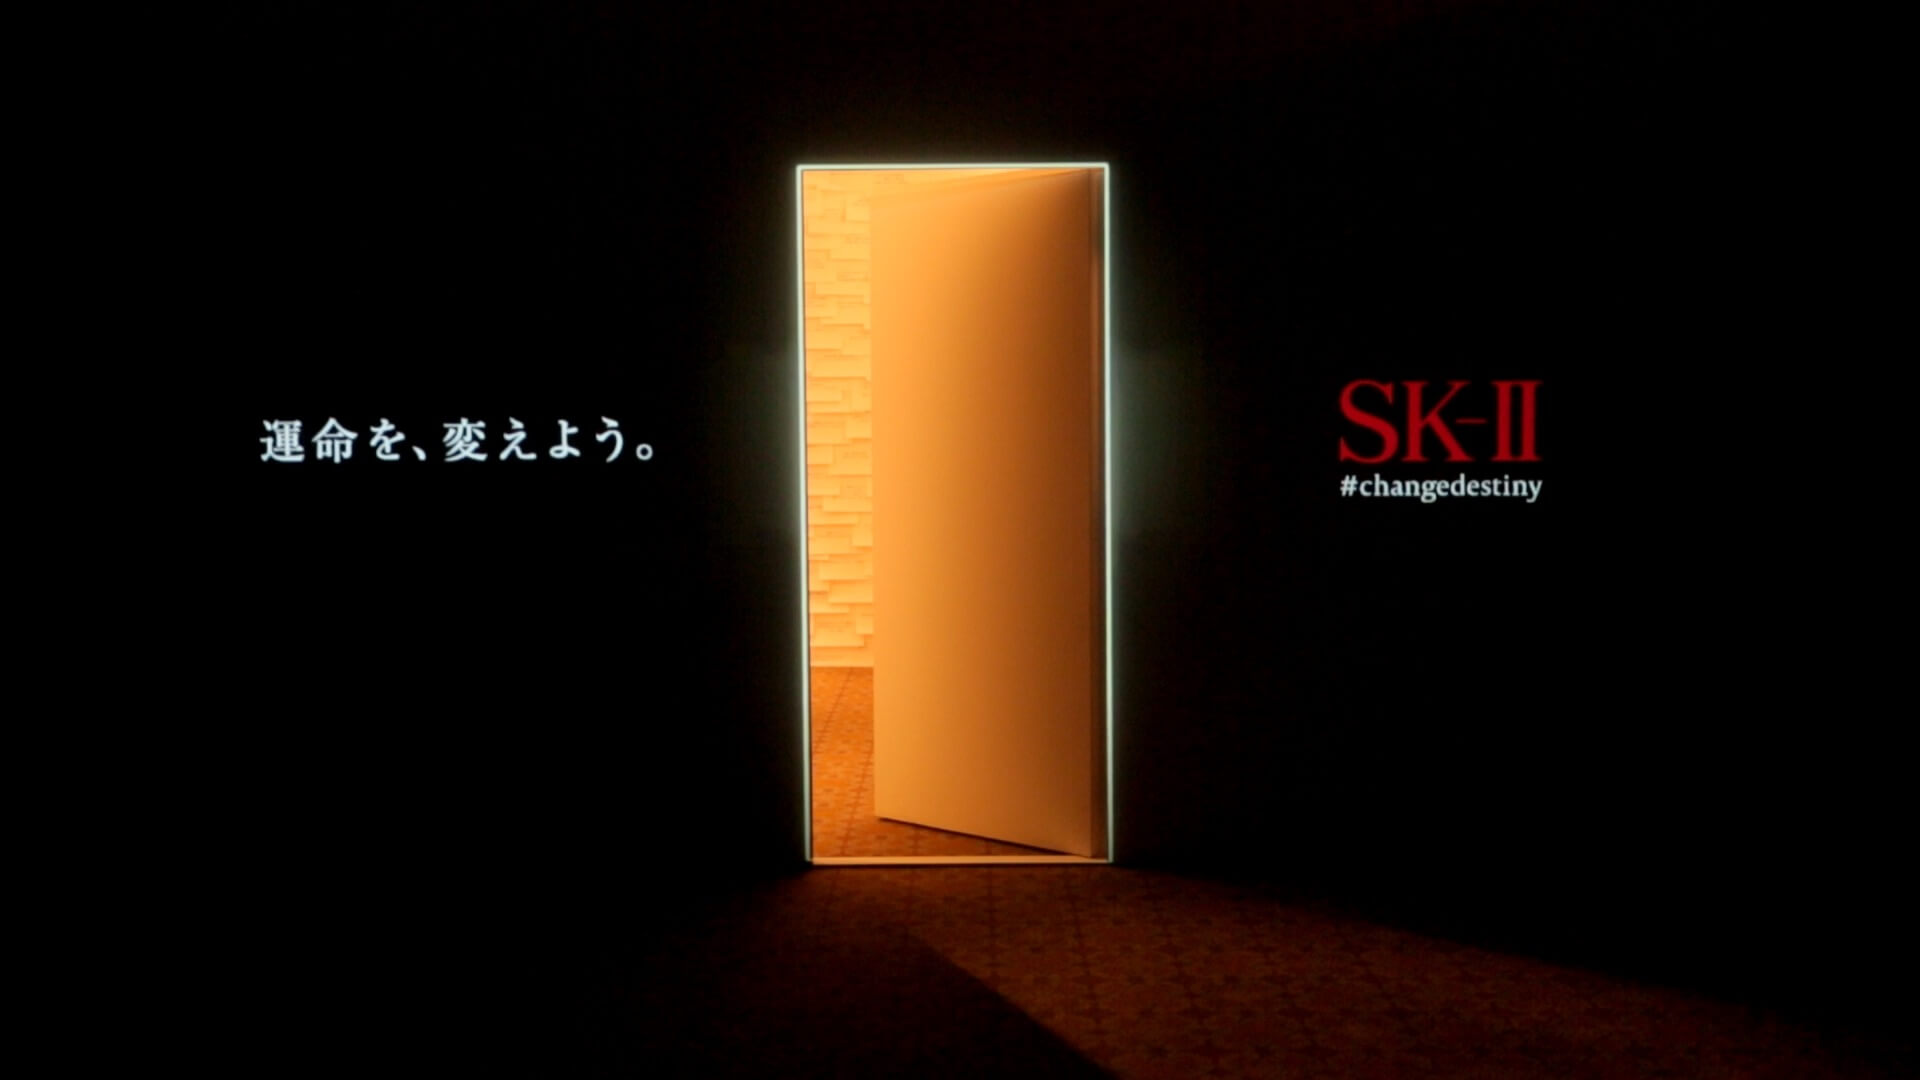 SK-Ⅱ #changedestiny